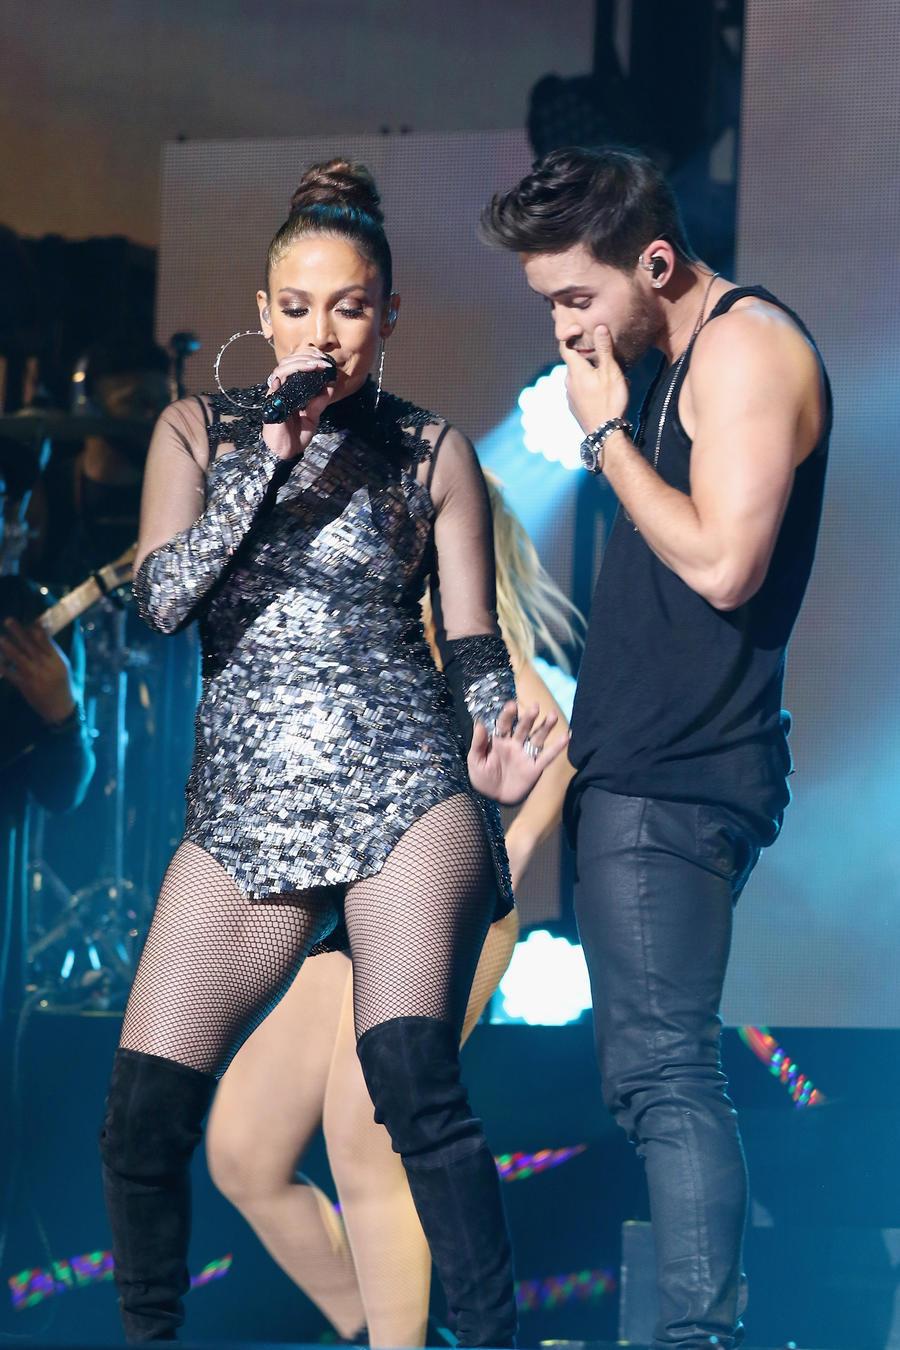 Prince Royce y JLo iHeartRadio Fiesta Latina Presented By Sprint - Show